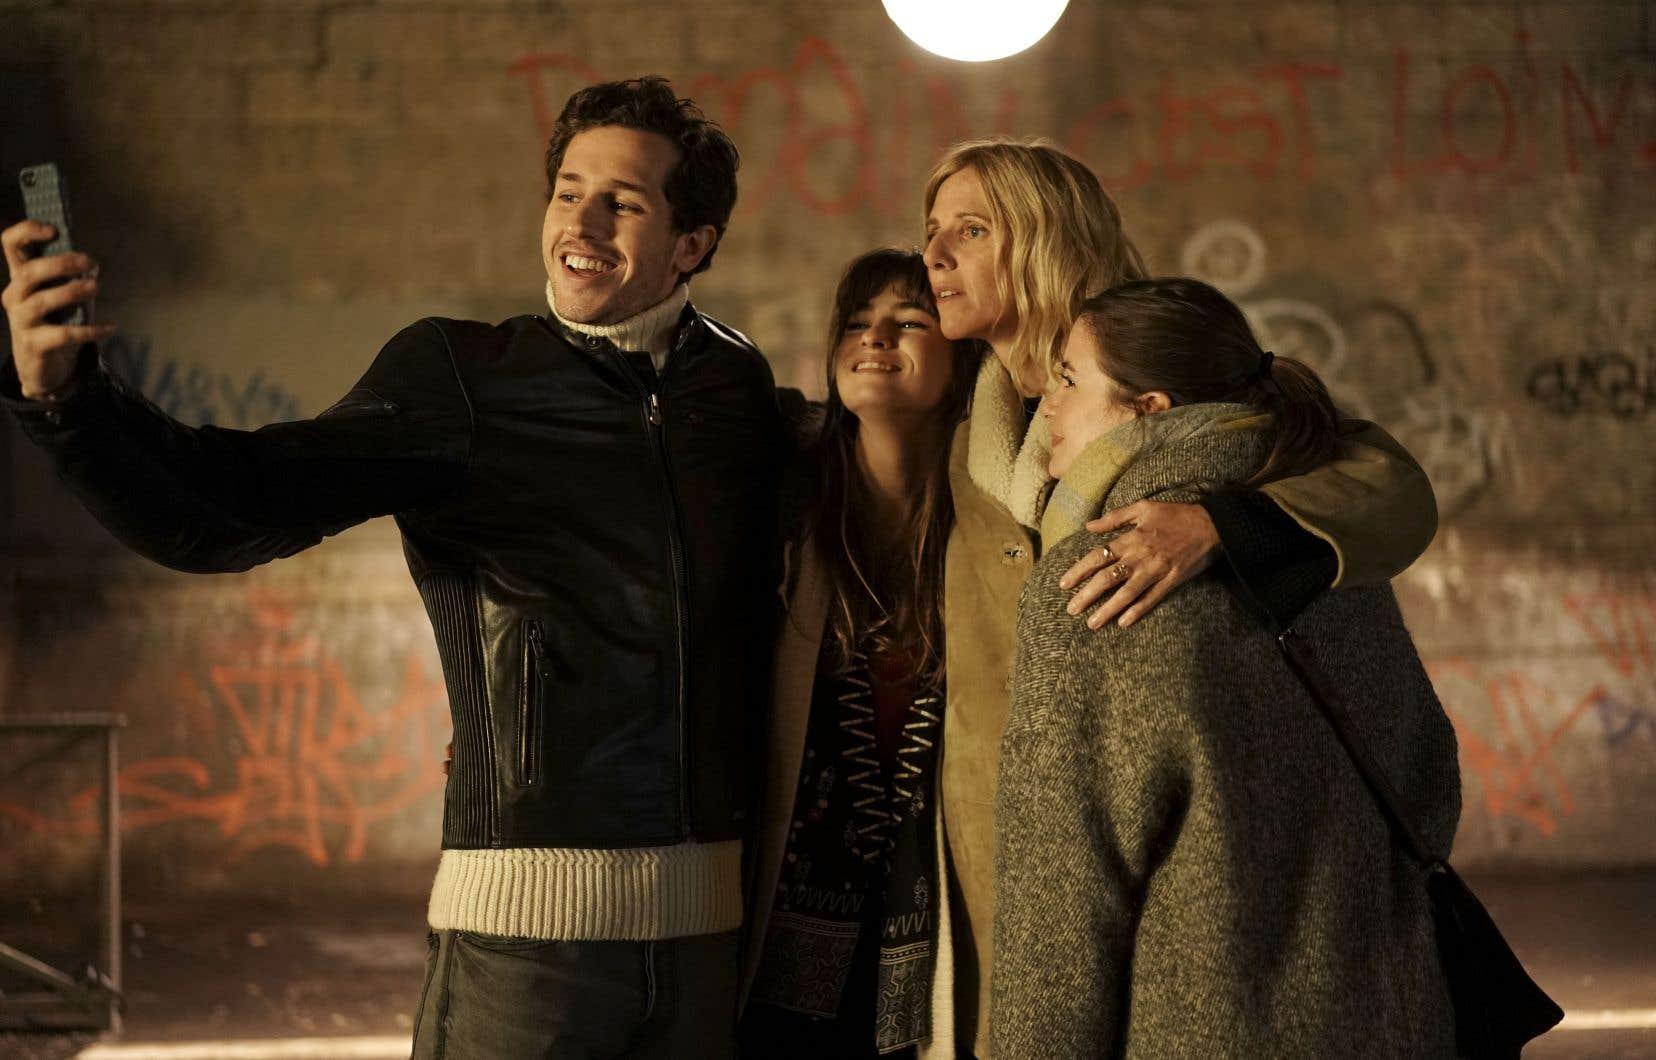 Héloïse (Sandrine Kiberlain) est mère de trois enfants, Théo (Victor Belmondo), Lola (Camille Claris) et Jade (Thaïs Alessandrin).